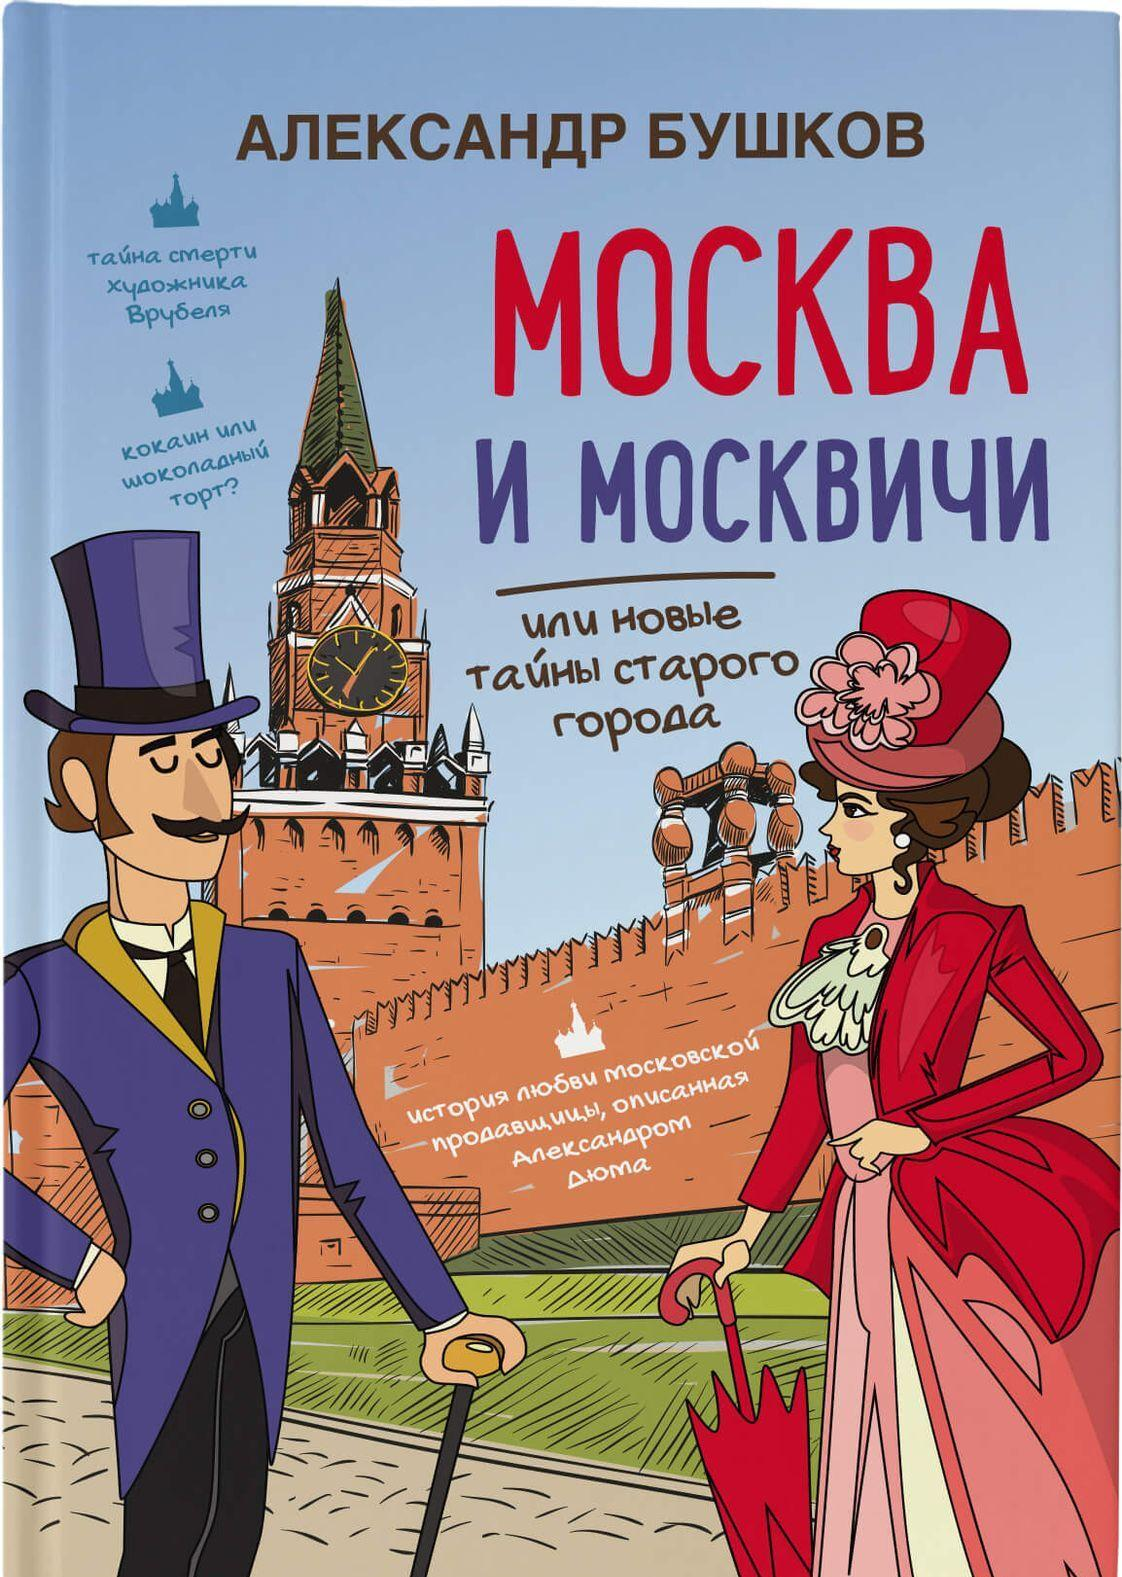 Moskva i moskvichi, ili novye tajny starogo goroda